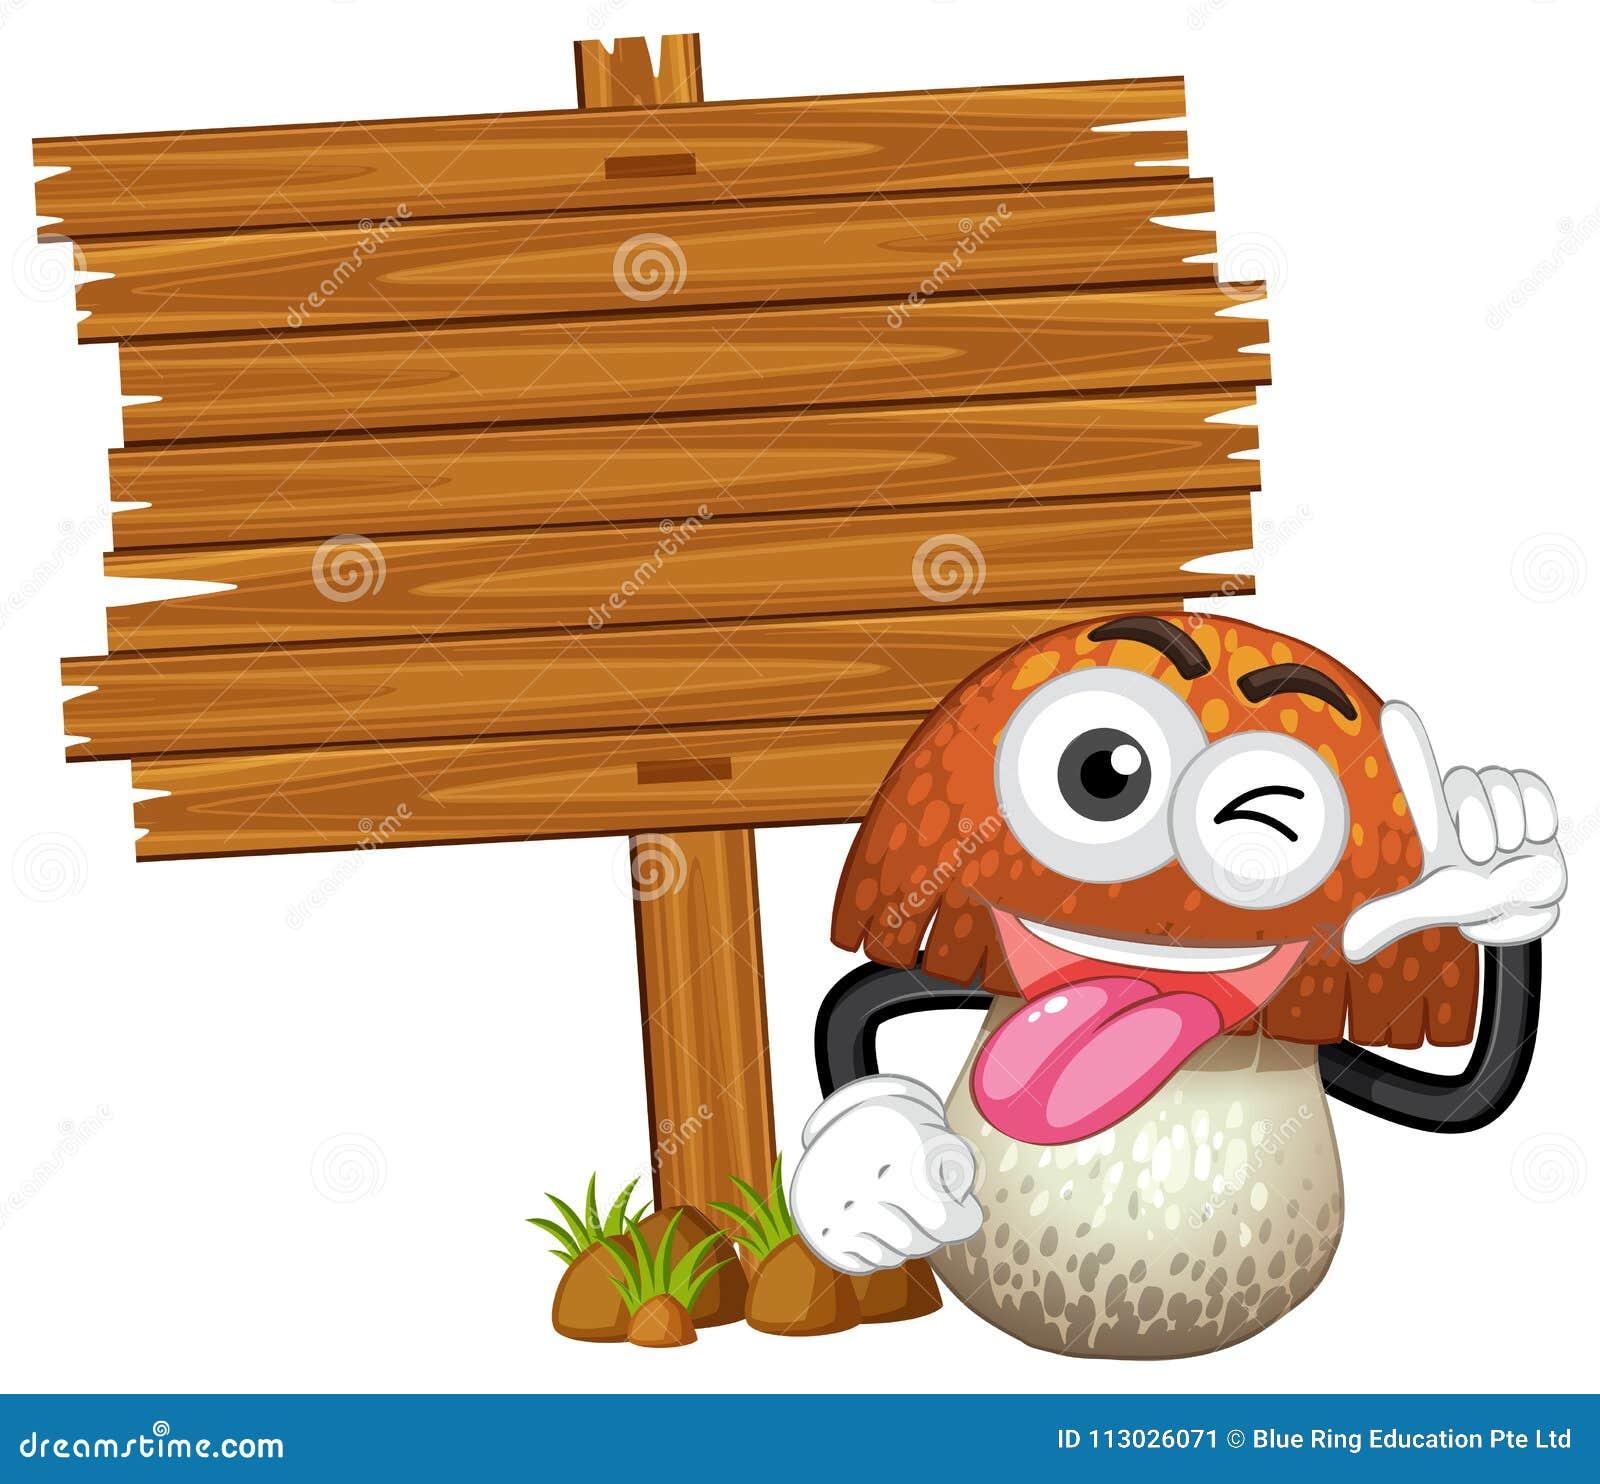 Tablero de madera con la seta linda